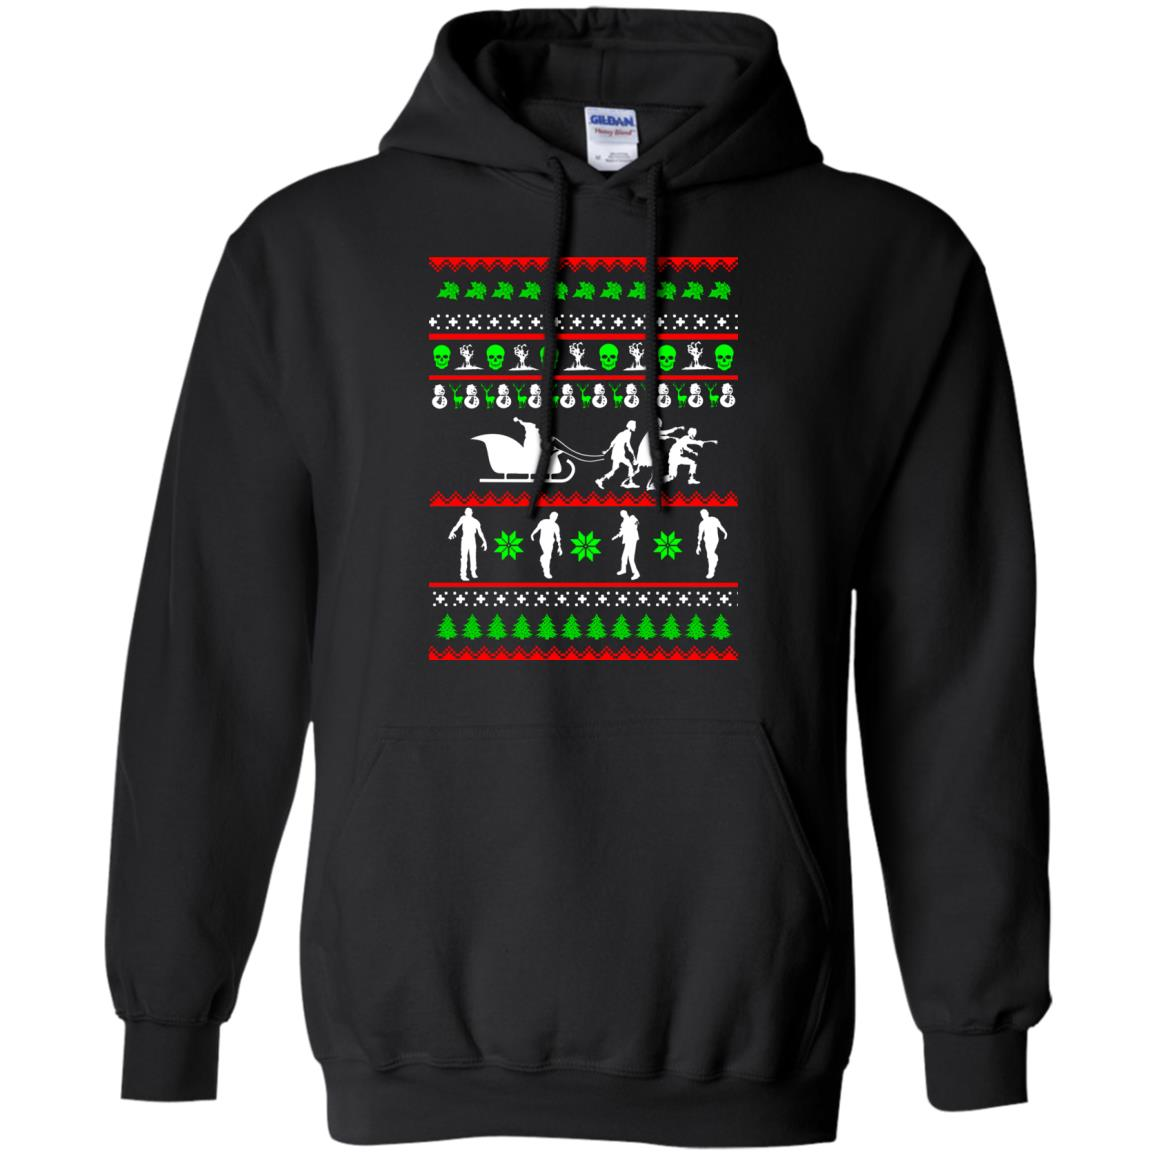 image 5833 - Zombie Christmas Sweater, Hoodie